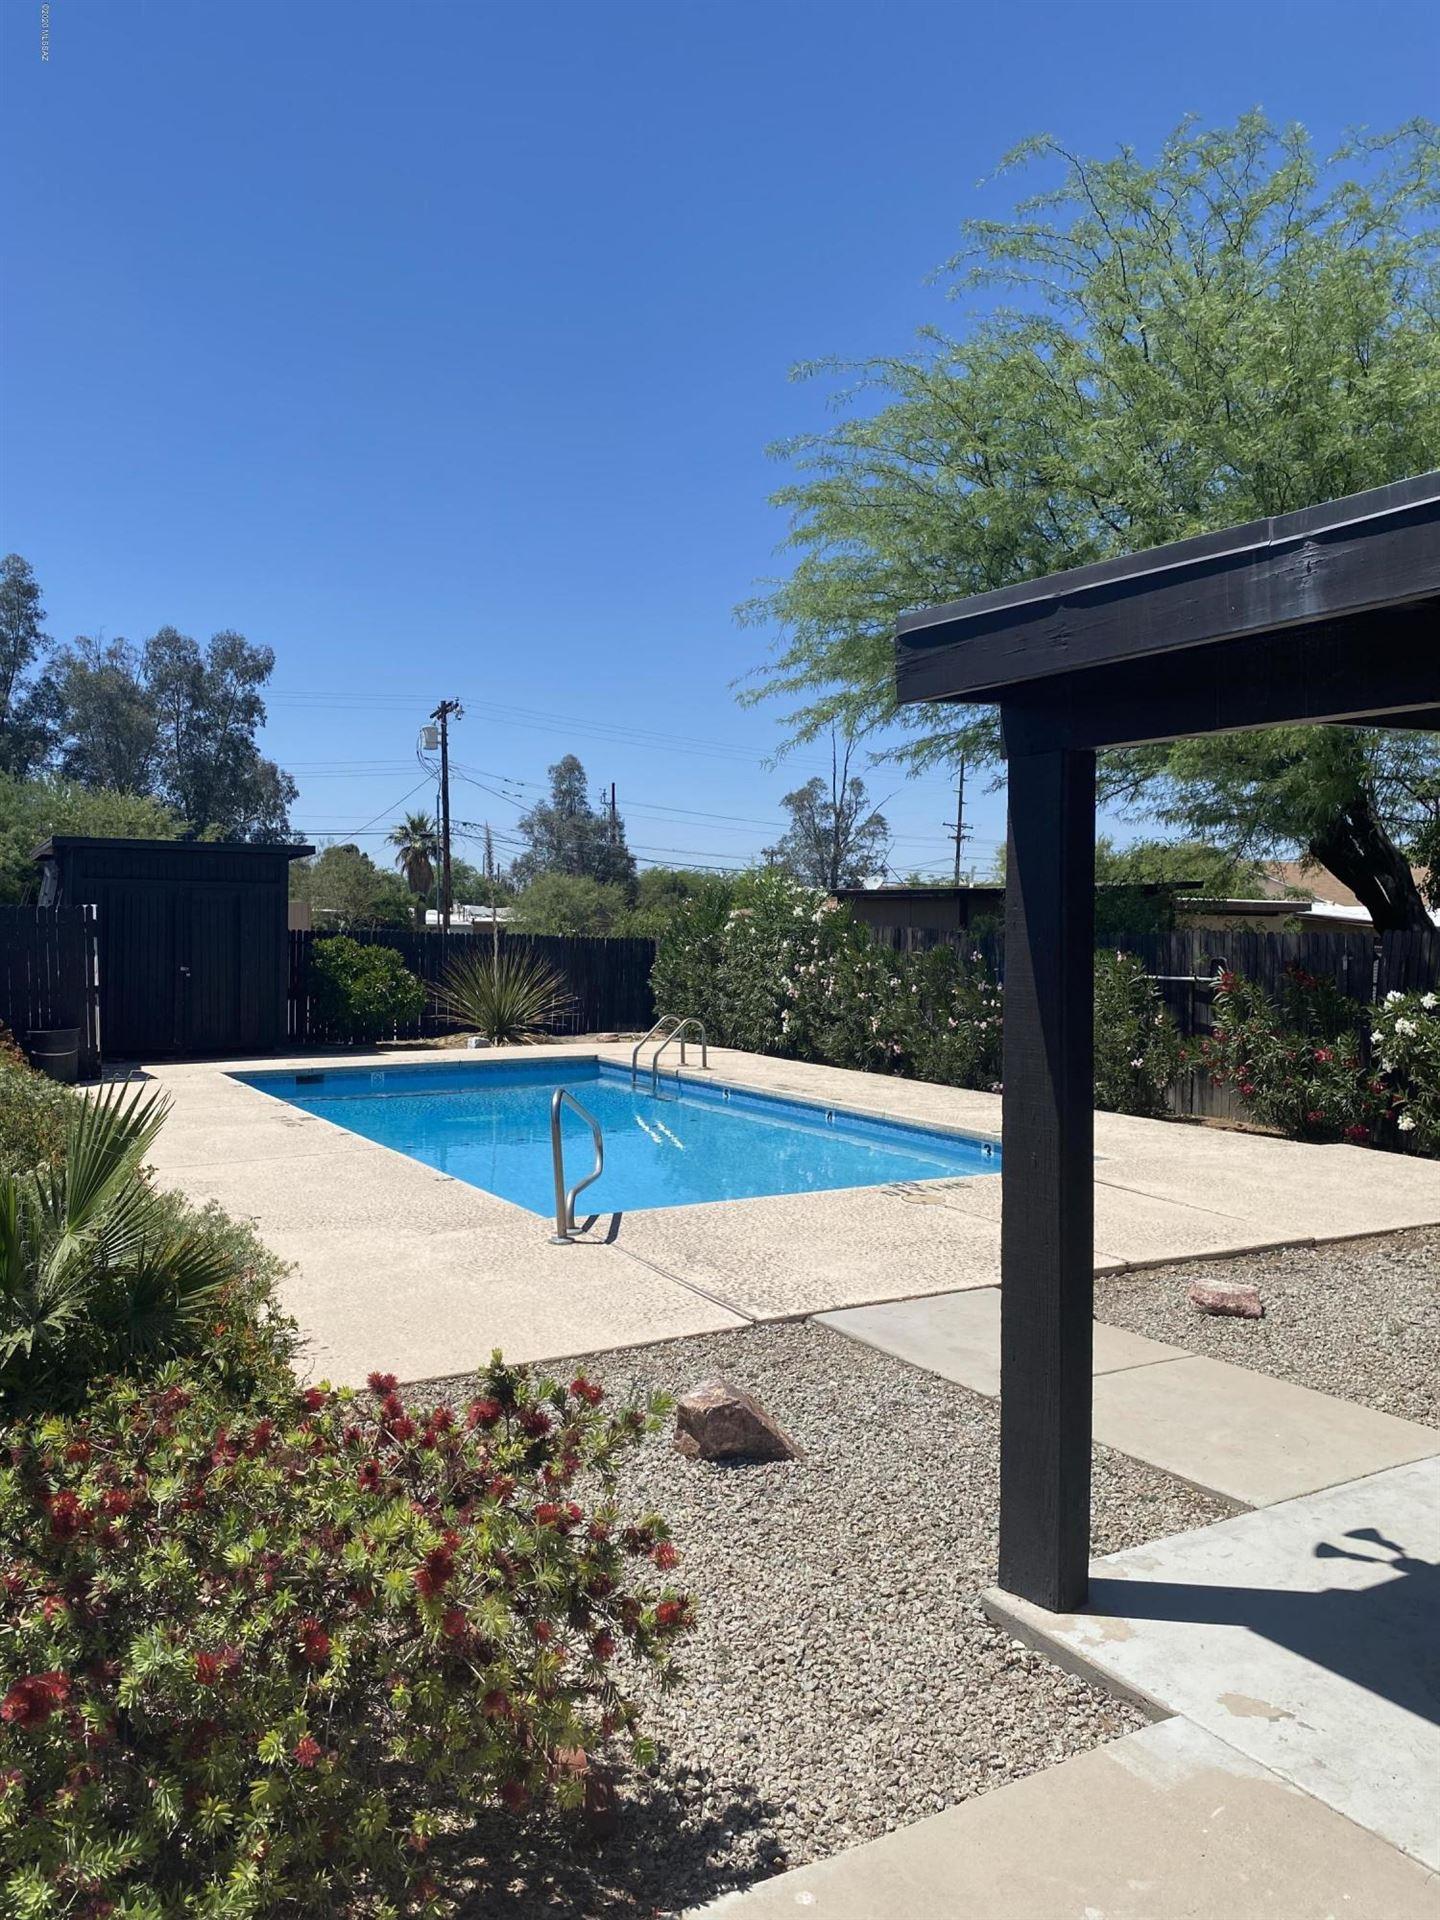 211 W Roger Road #6, Tucson, AZ 85705 - MLS#: 22105599